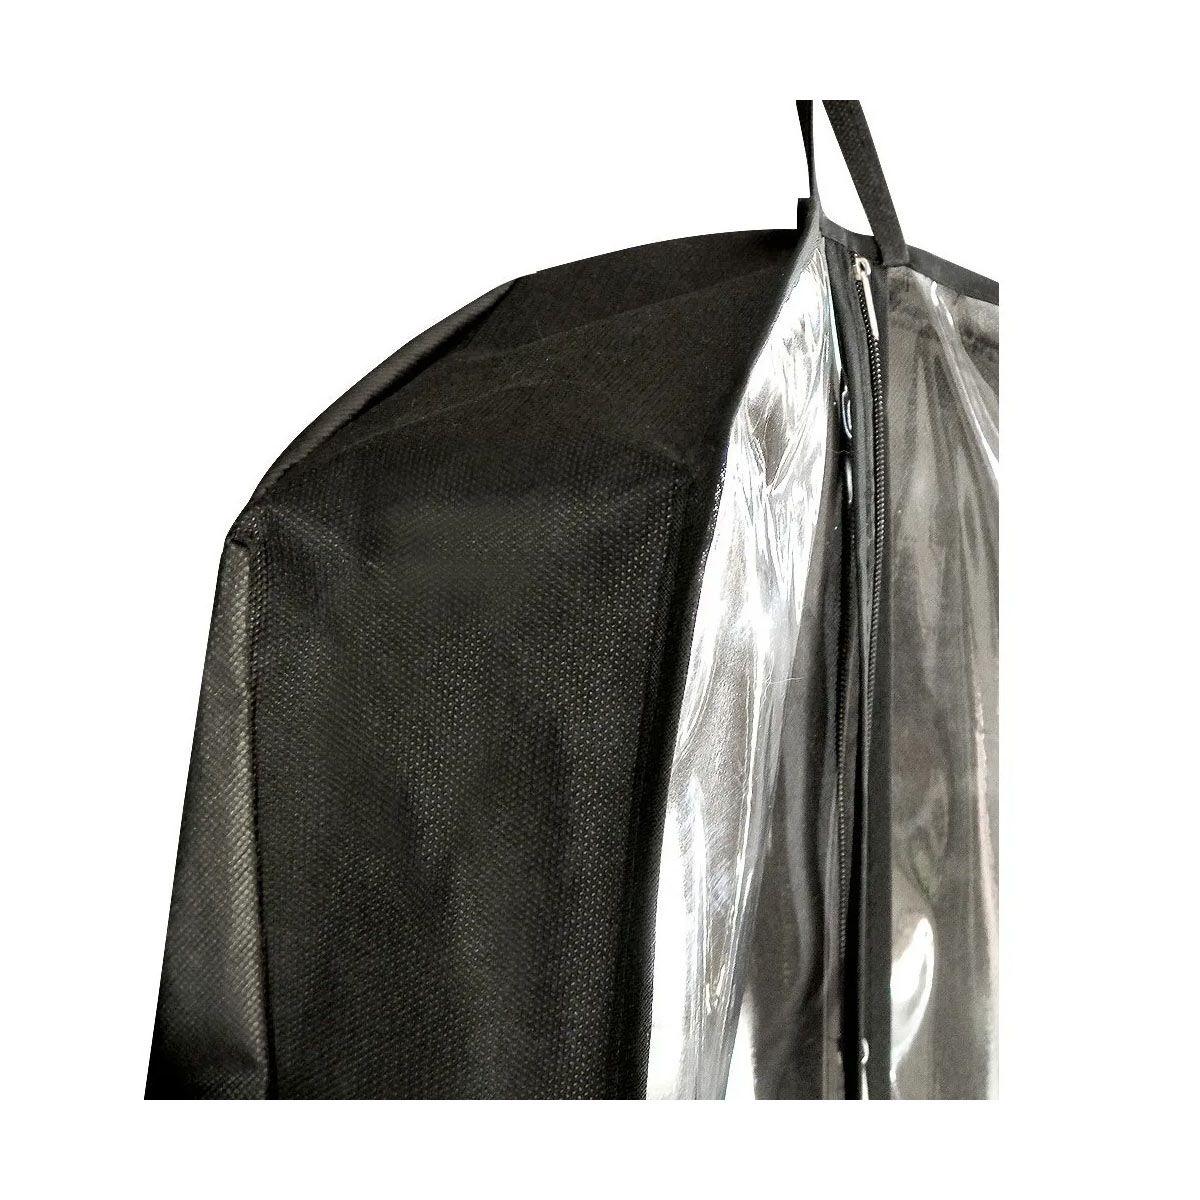 Capa Vestido Noiva Frente Transparente C/ Lateral